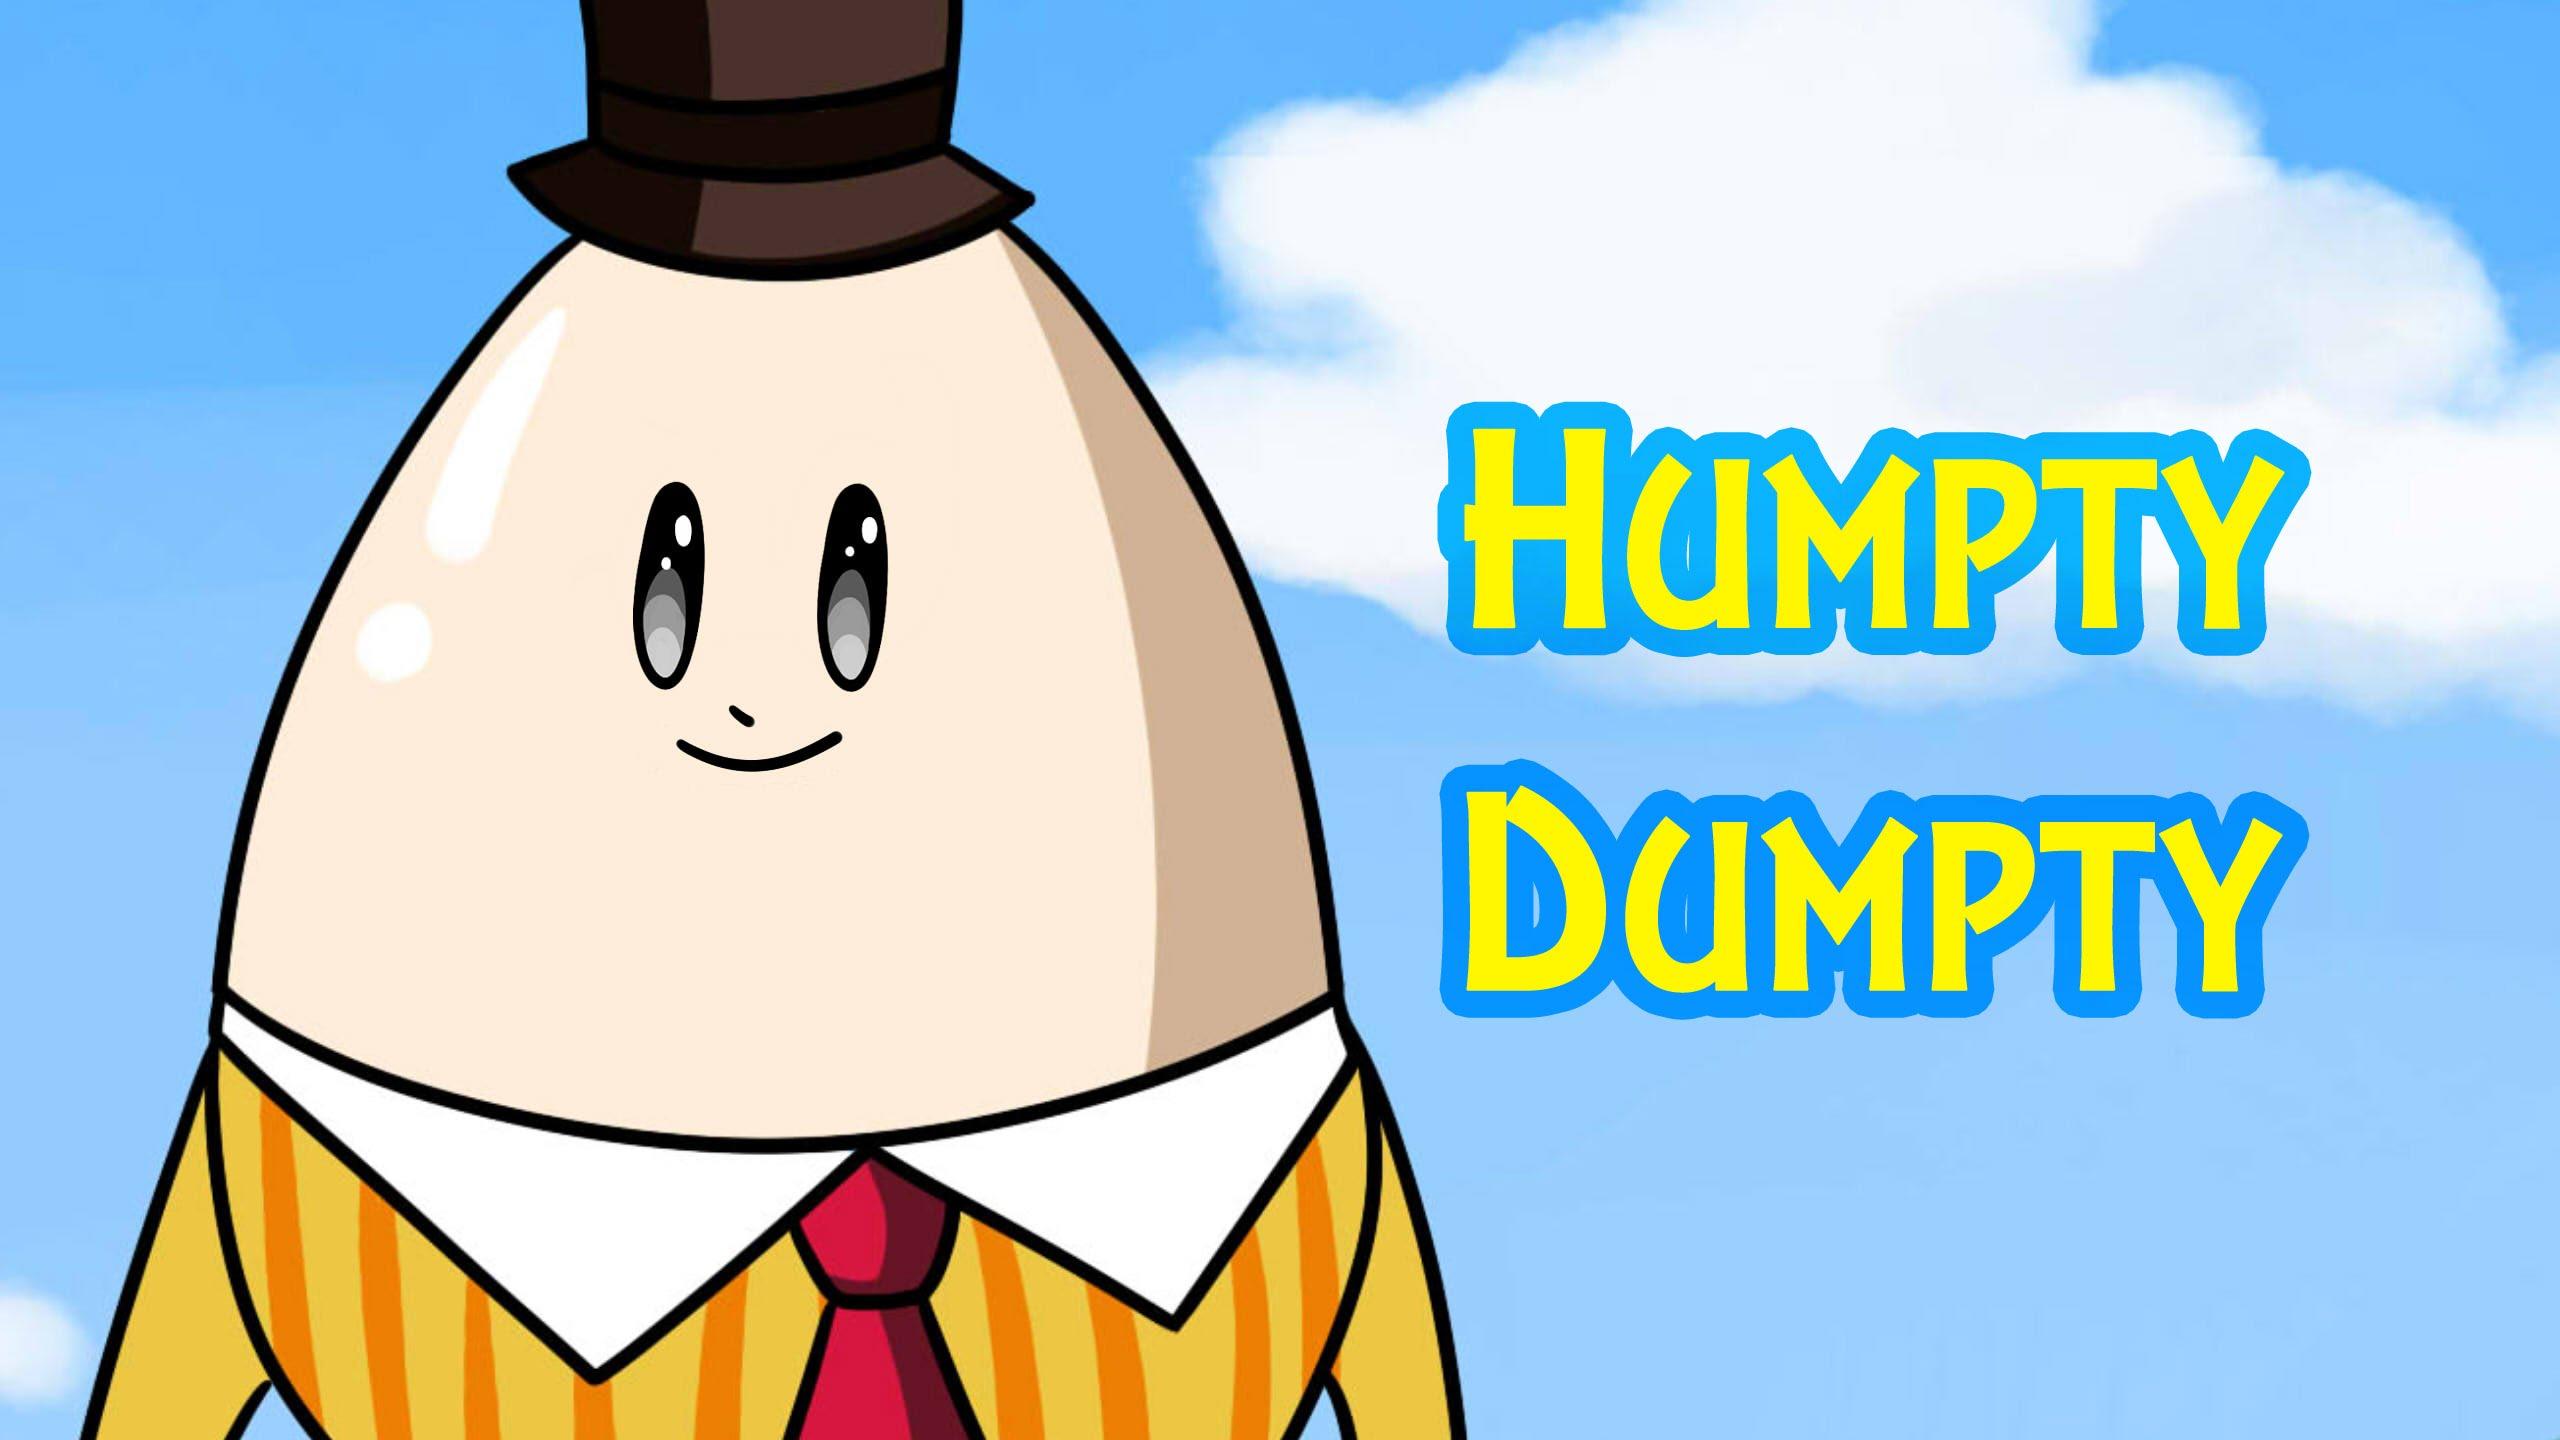 2560x1440 Humpty Dumpty